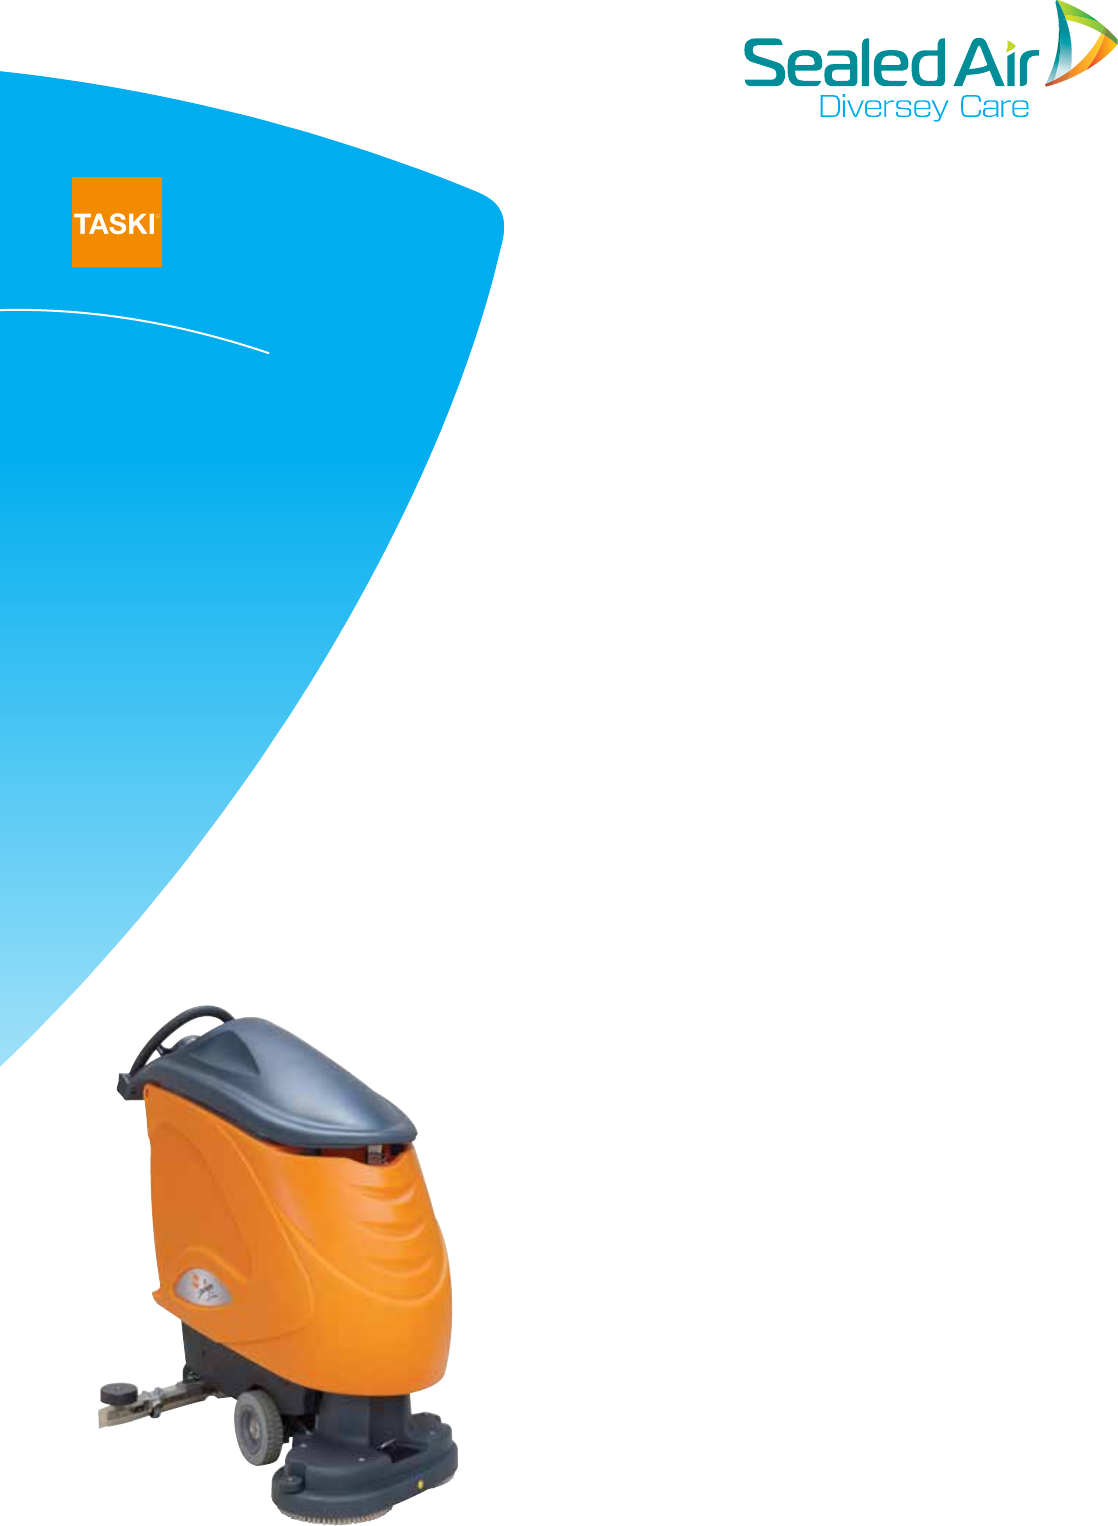 sweepscrub taski swingo 1650b walk behind floor scrubber rh usermanual wiki Taski Floor Machines Taski Vacuum Parts